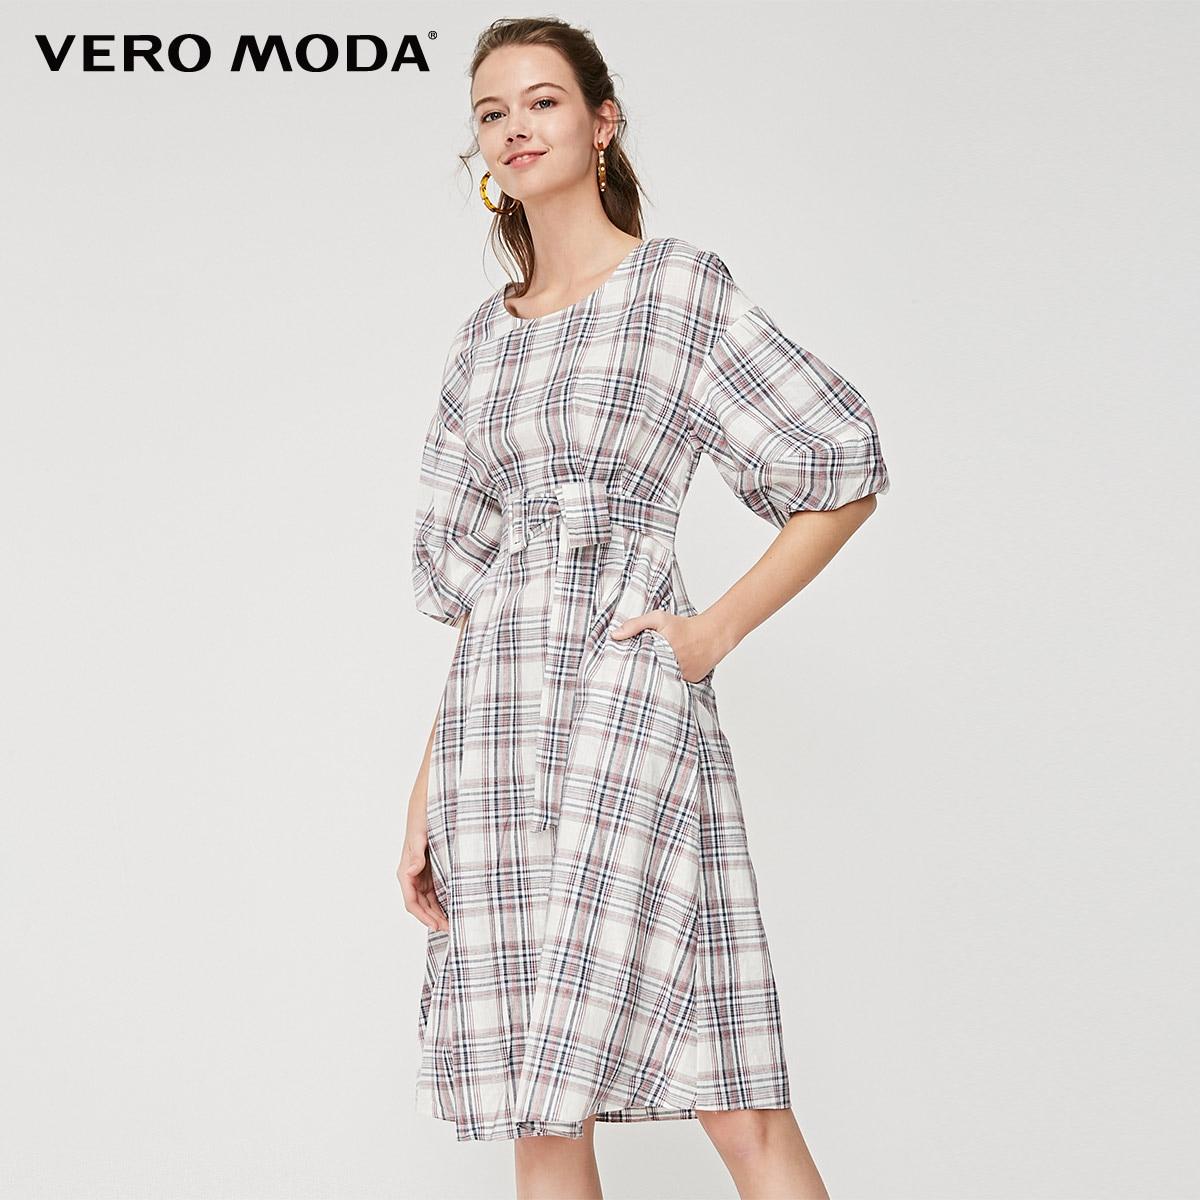 Vero Moda Women's Linen Plaid Fabric Lace-up Elbow Sleeves Dress   31916Z505